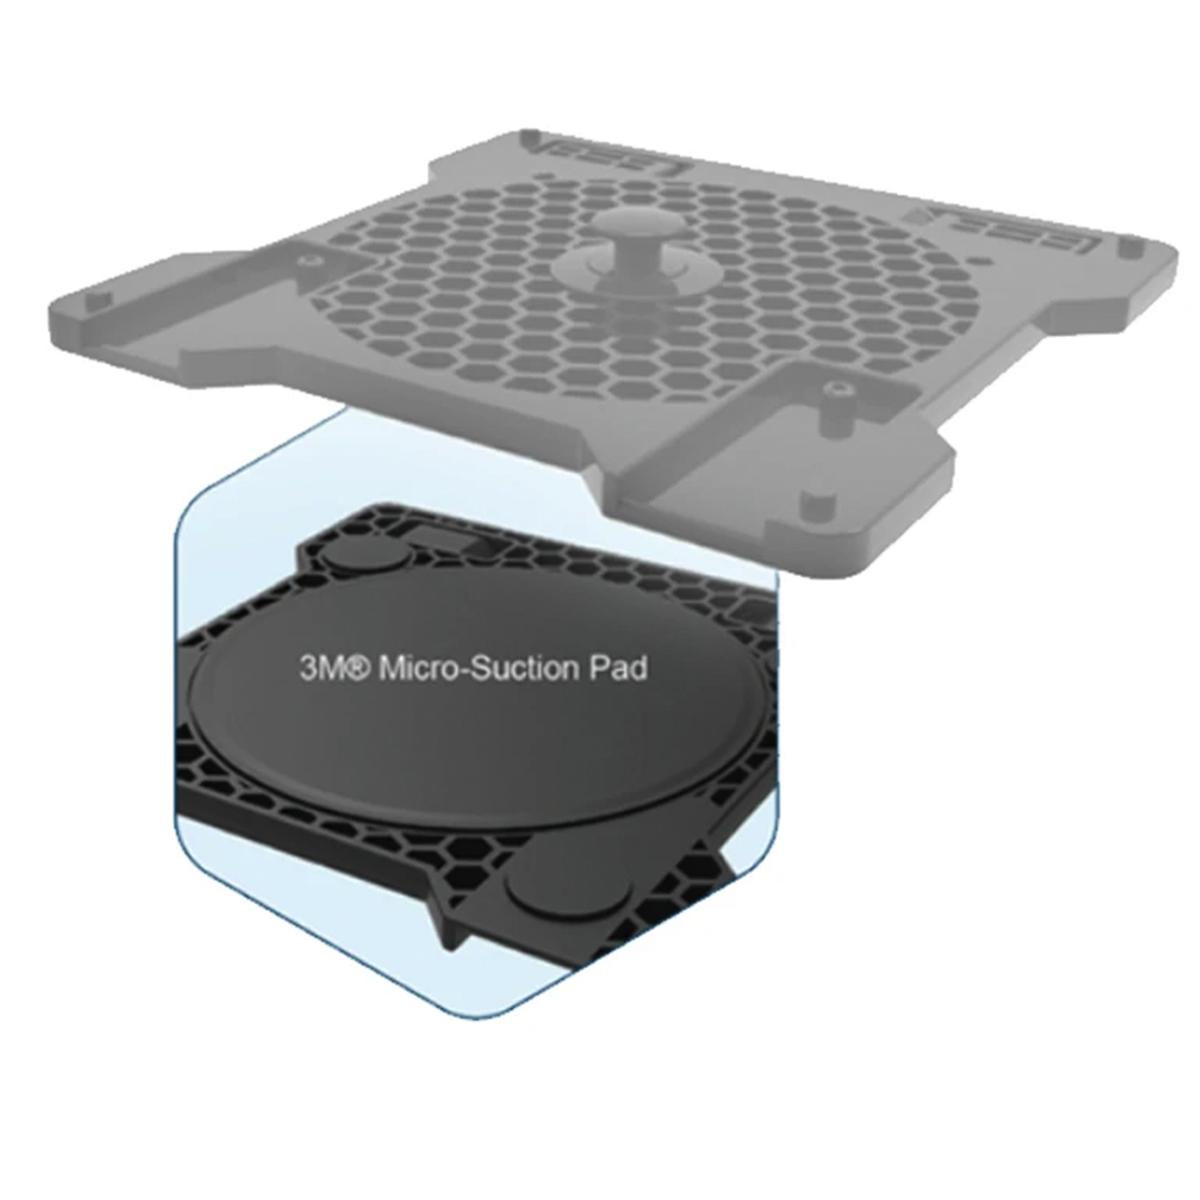 HONEYCOMB 3M MICRO-SUCTION PADS (NO PLASTIC MOUNTING PLATE) FOR UNI (THROTTLE AND YOKE) ハニカム アルファ & ブラボー 共用 3M マイクロサクションパッド